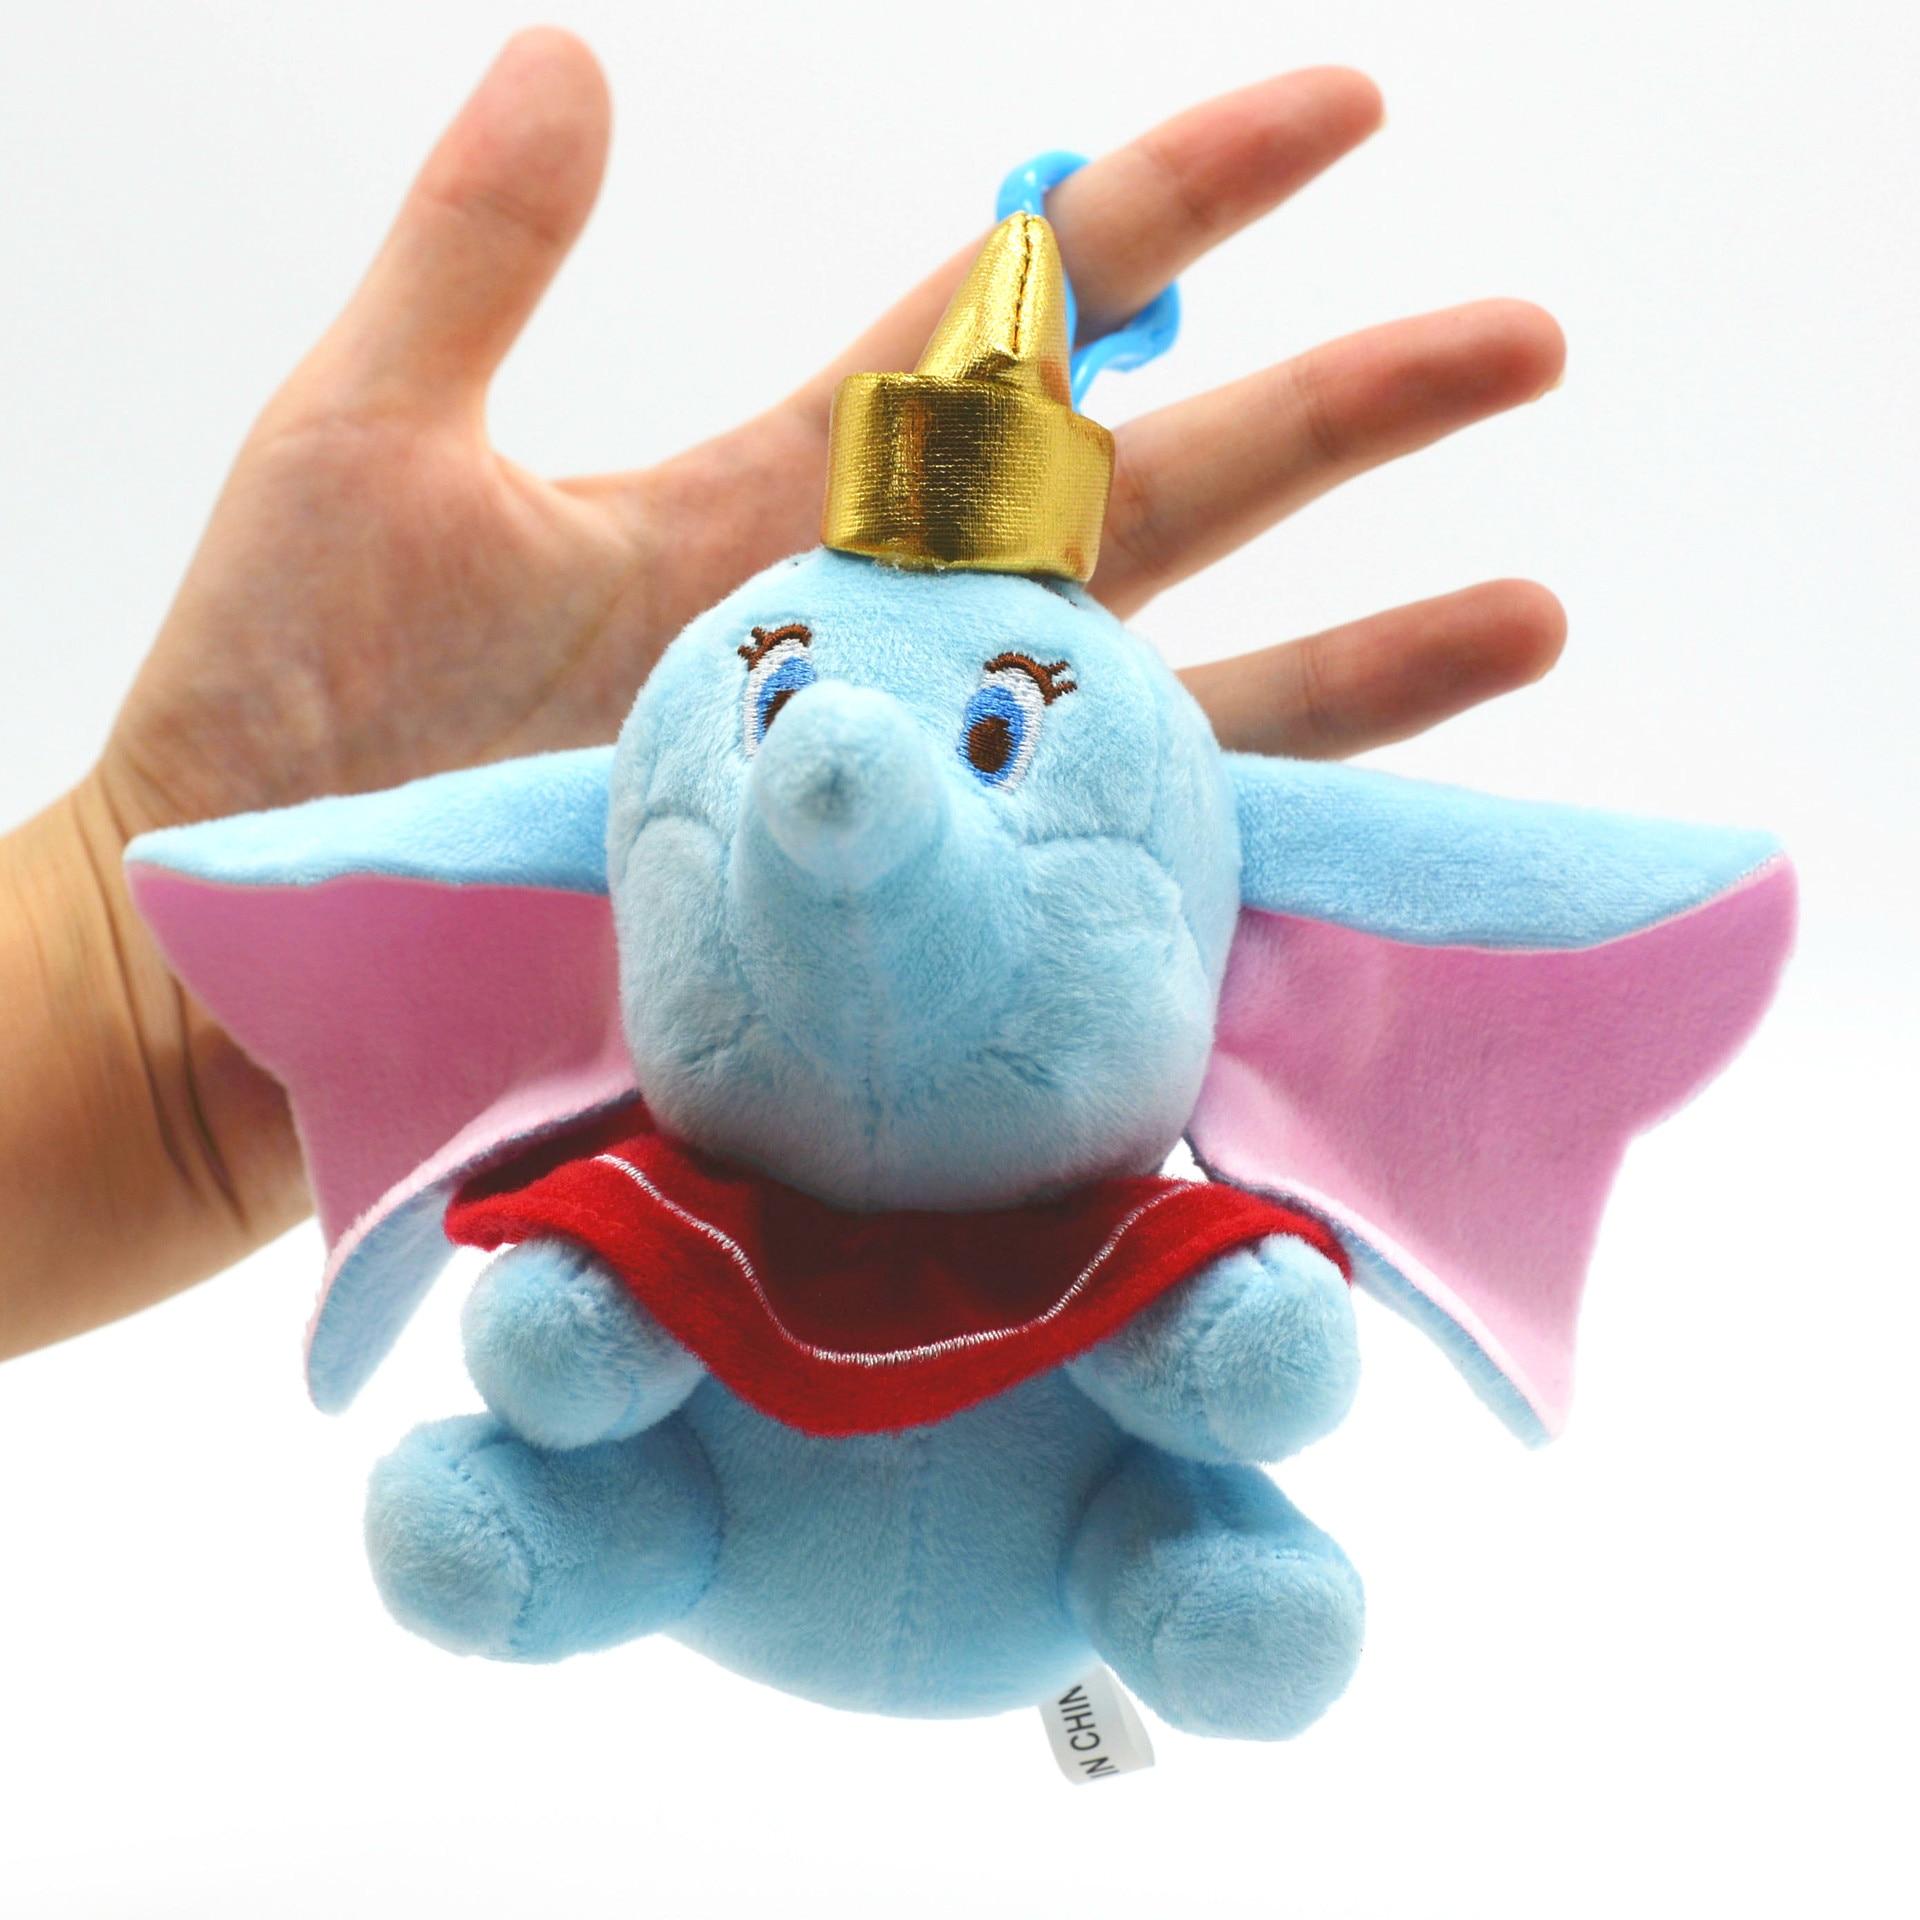 10cm peluche Dumbo charms dibujos animados muñecas de peluche regalo